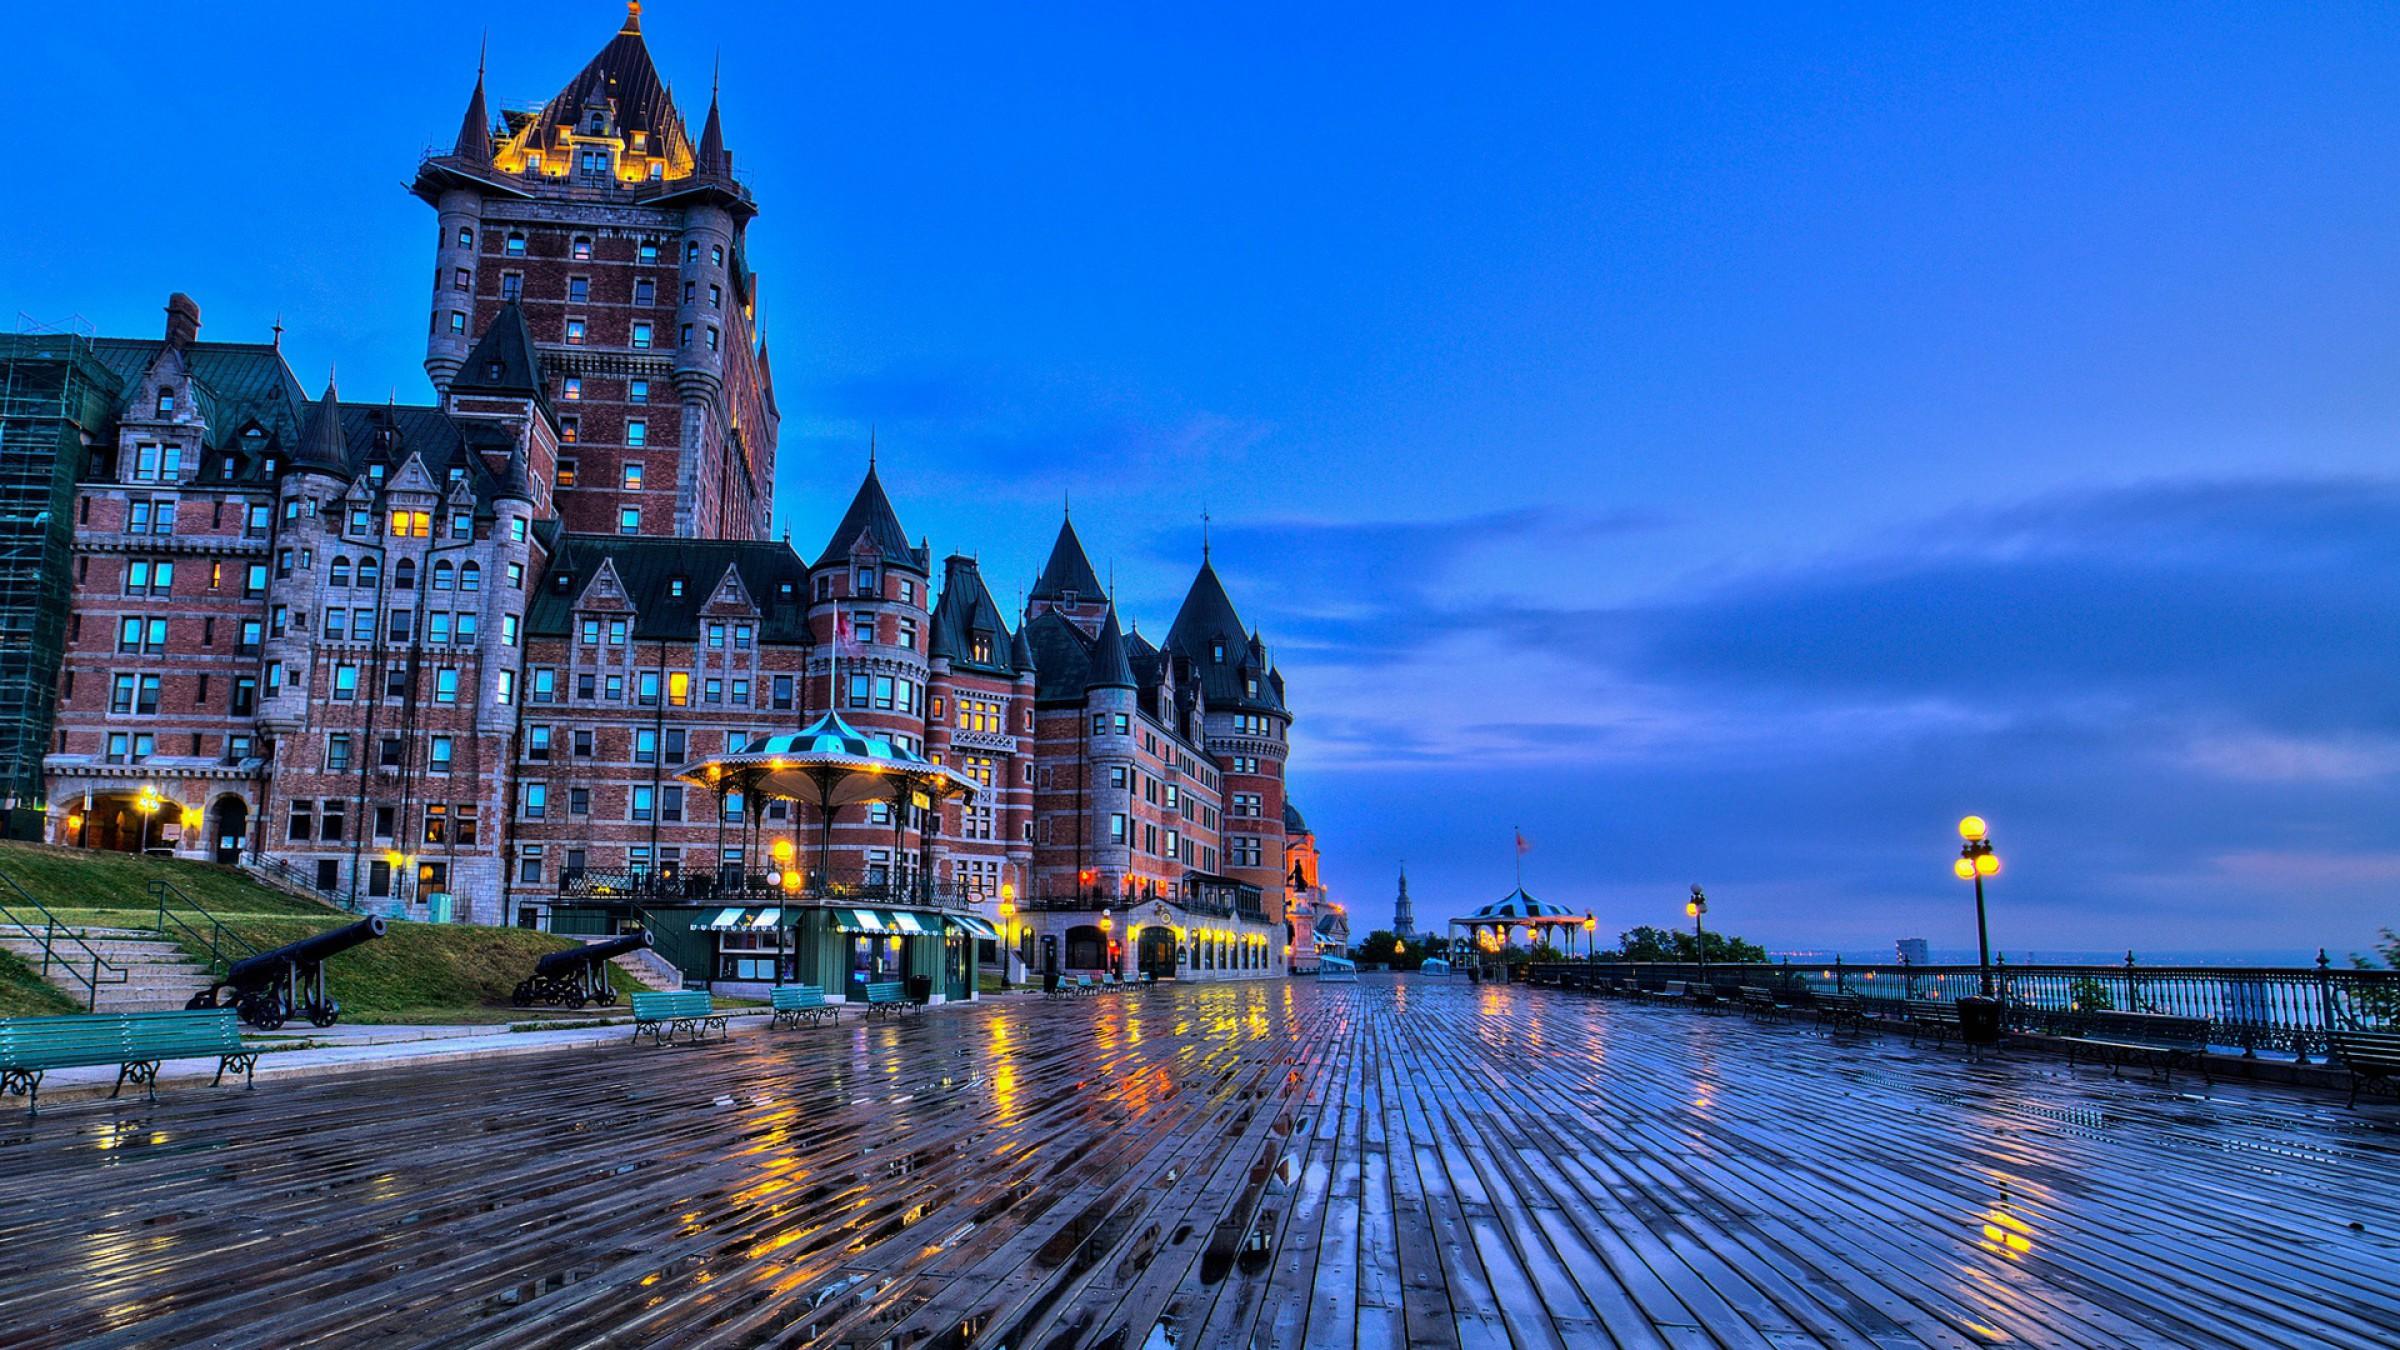 Quebec-City-Wallpapers.jpg